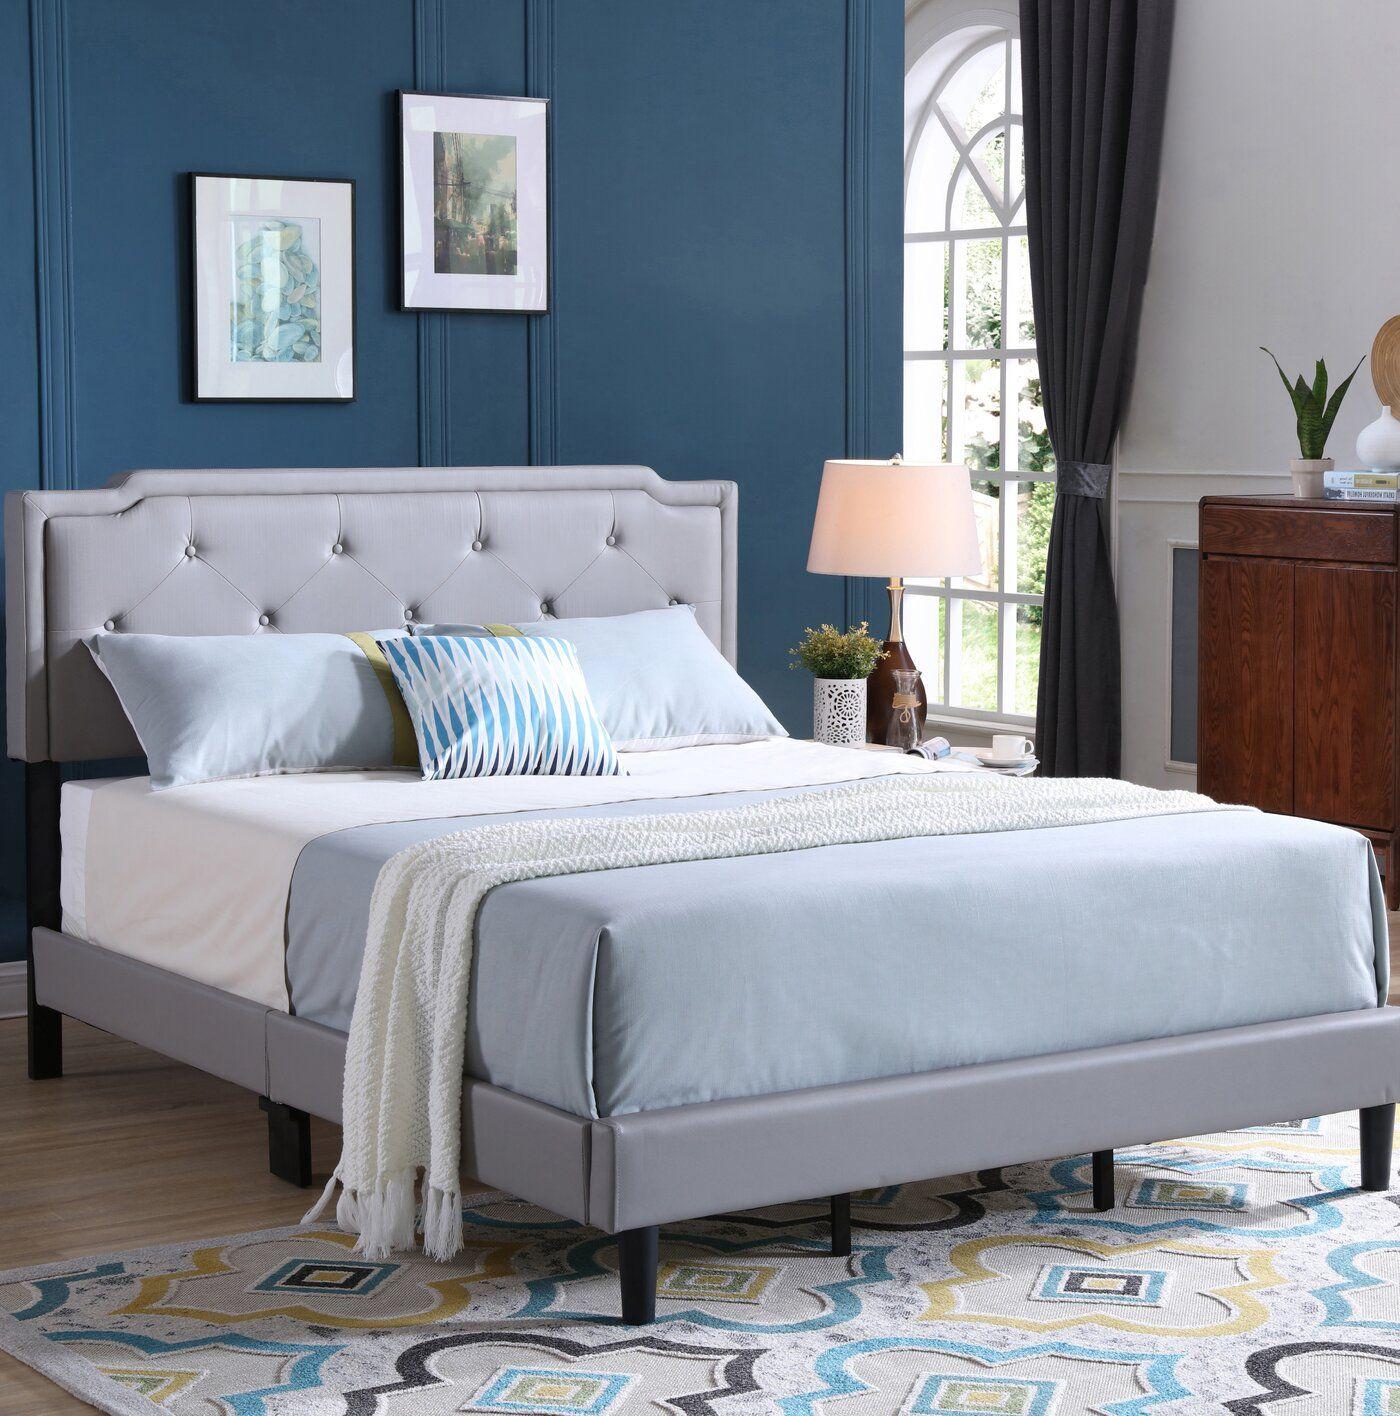 Indianapolis Upholstered Standard Bed Adjustable beds